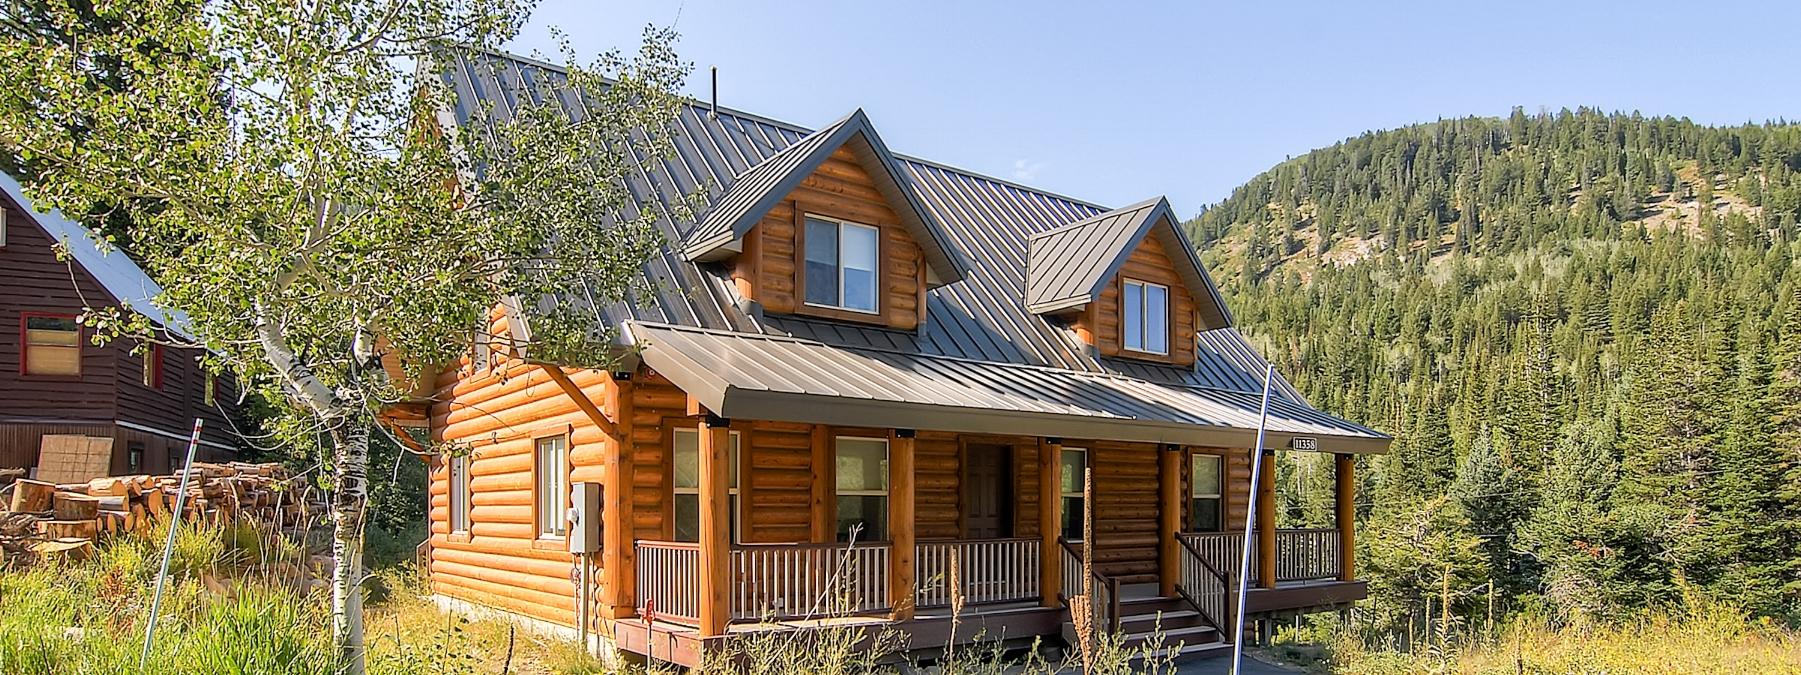 salt lake city vacation rentals homes cabins condos